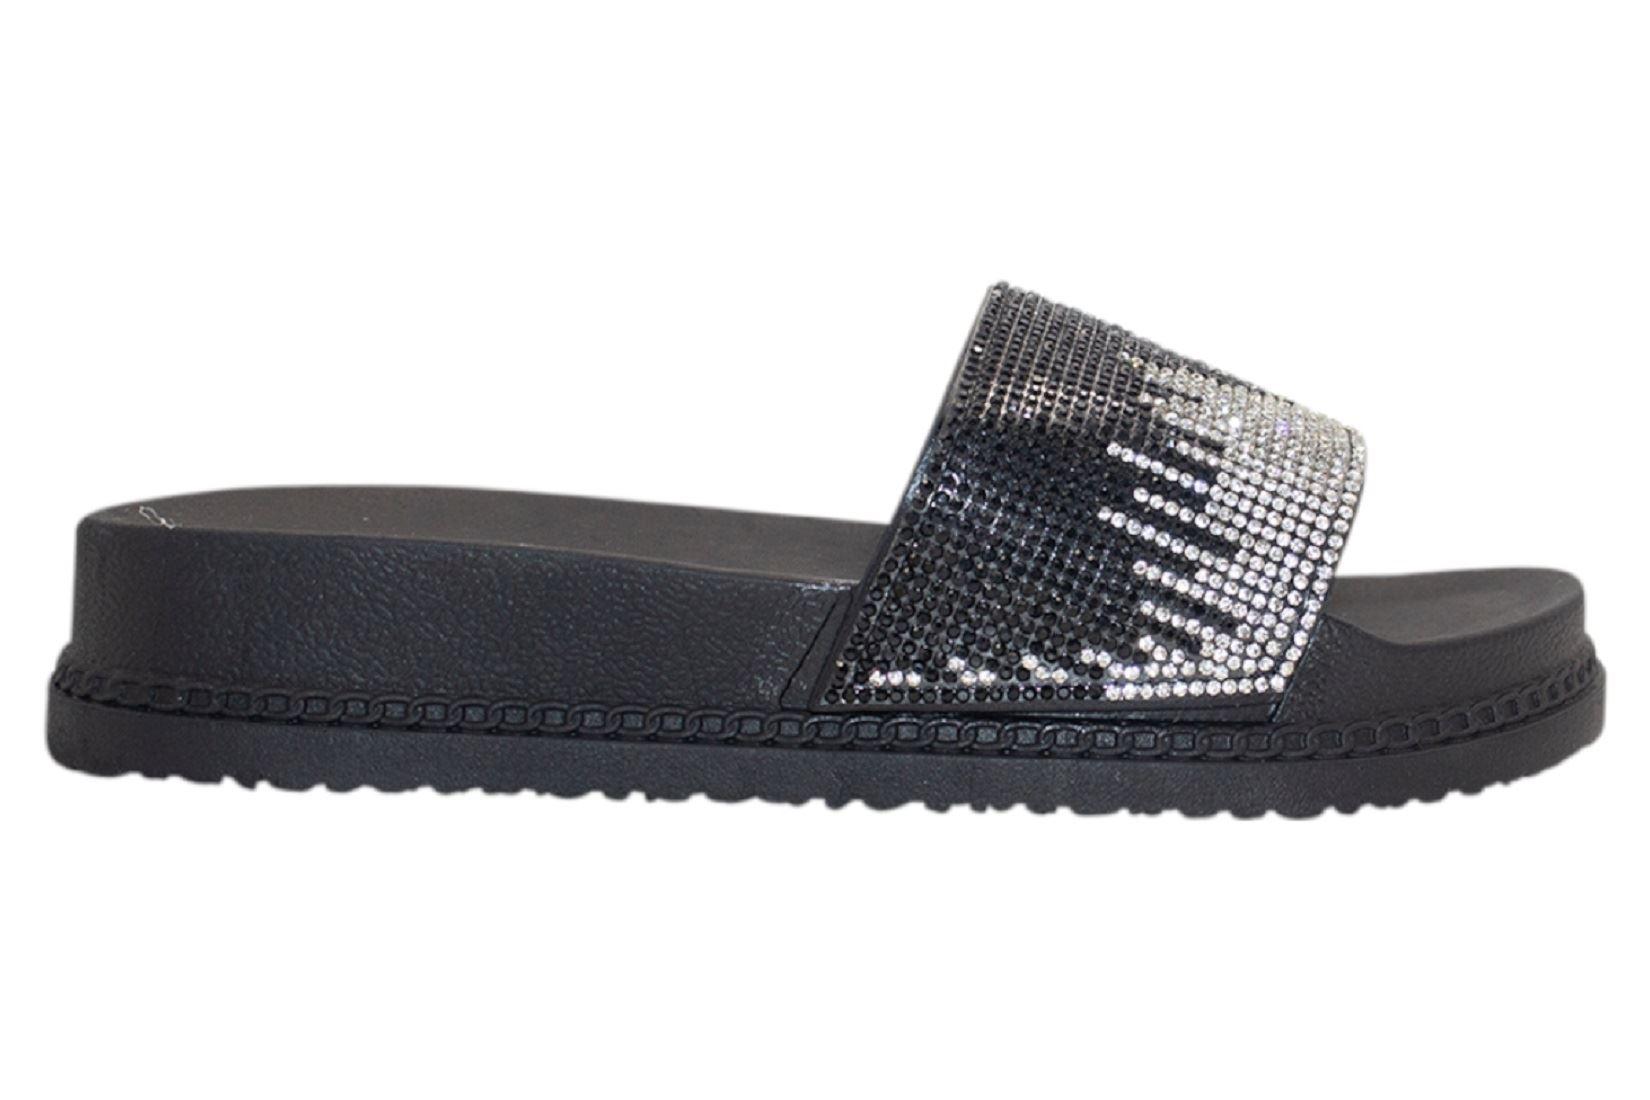 Womens-Sliders-Casual-Slippers-Mules-Ladies-Diamante-Flip-Flop-Sandals-Shoes thumbnail 15